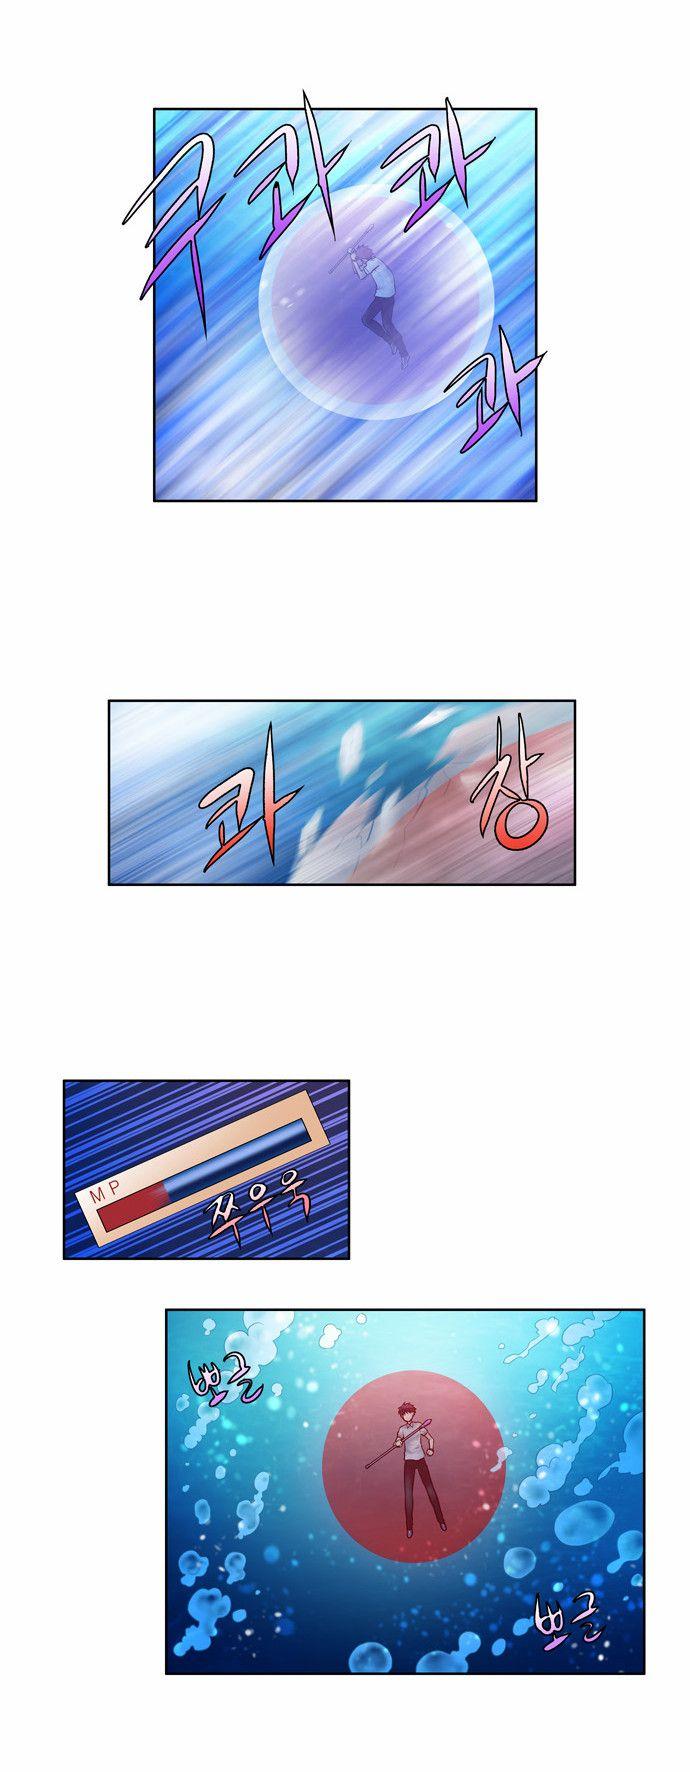 http://c5.ninemanga.com/es_manga/pic2/61/1725/502851/70d824bfb41b6e2f1a3358a7d09b8910.jpg Page 3